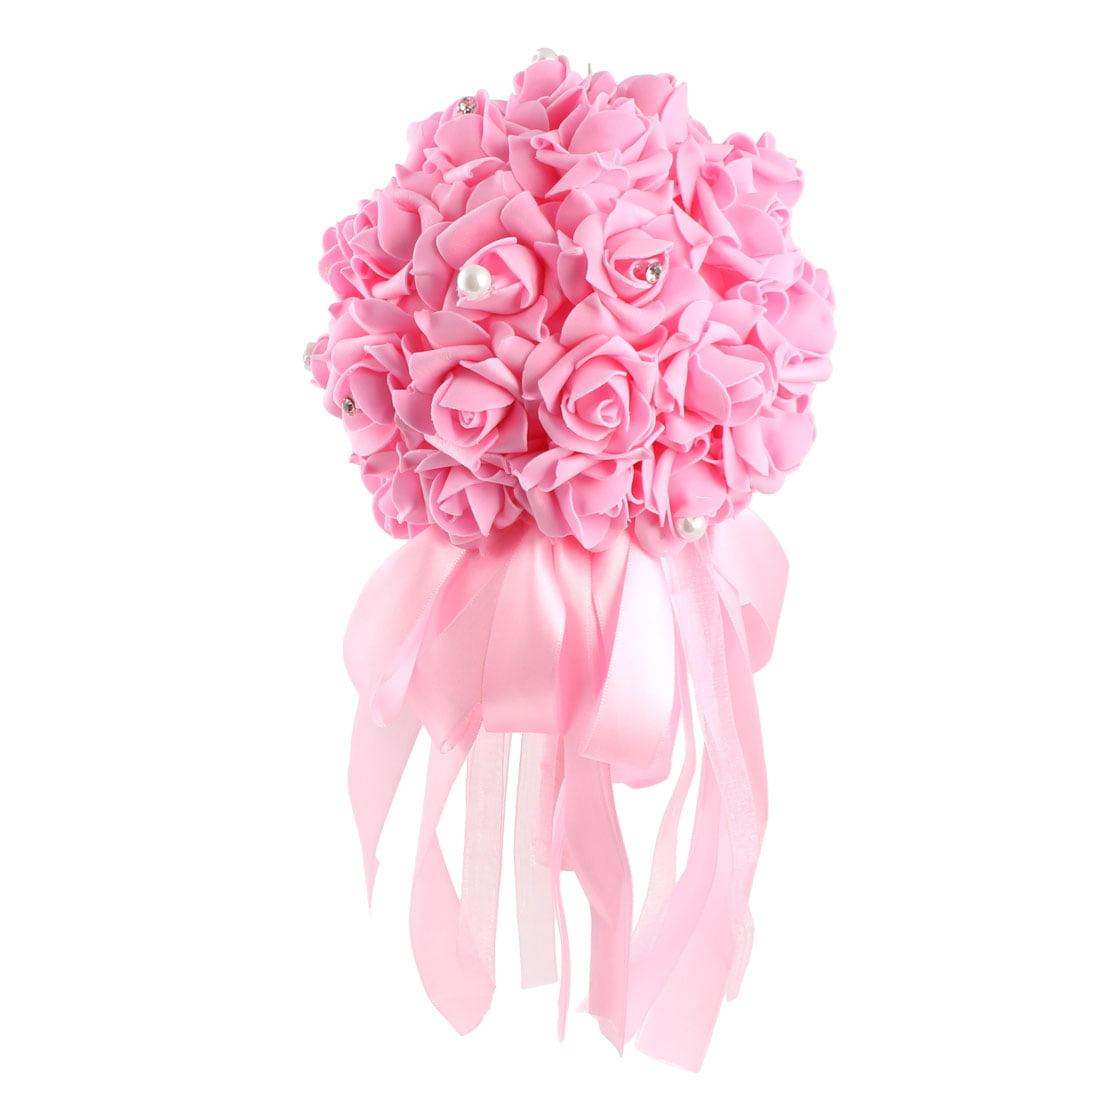 Banquet Bridal Wedding Bridesmaid Holding Bouquet Artificial Rose Flower Pink